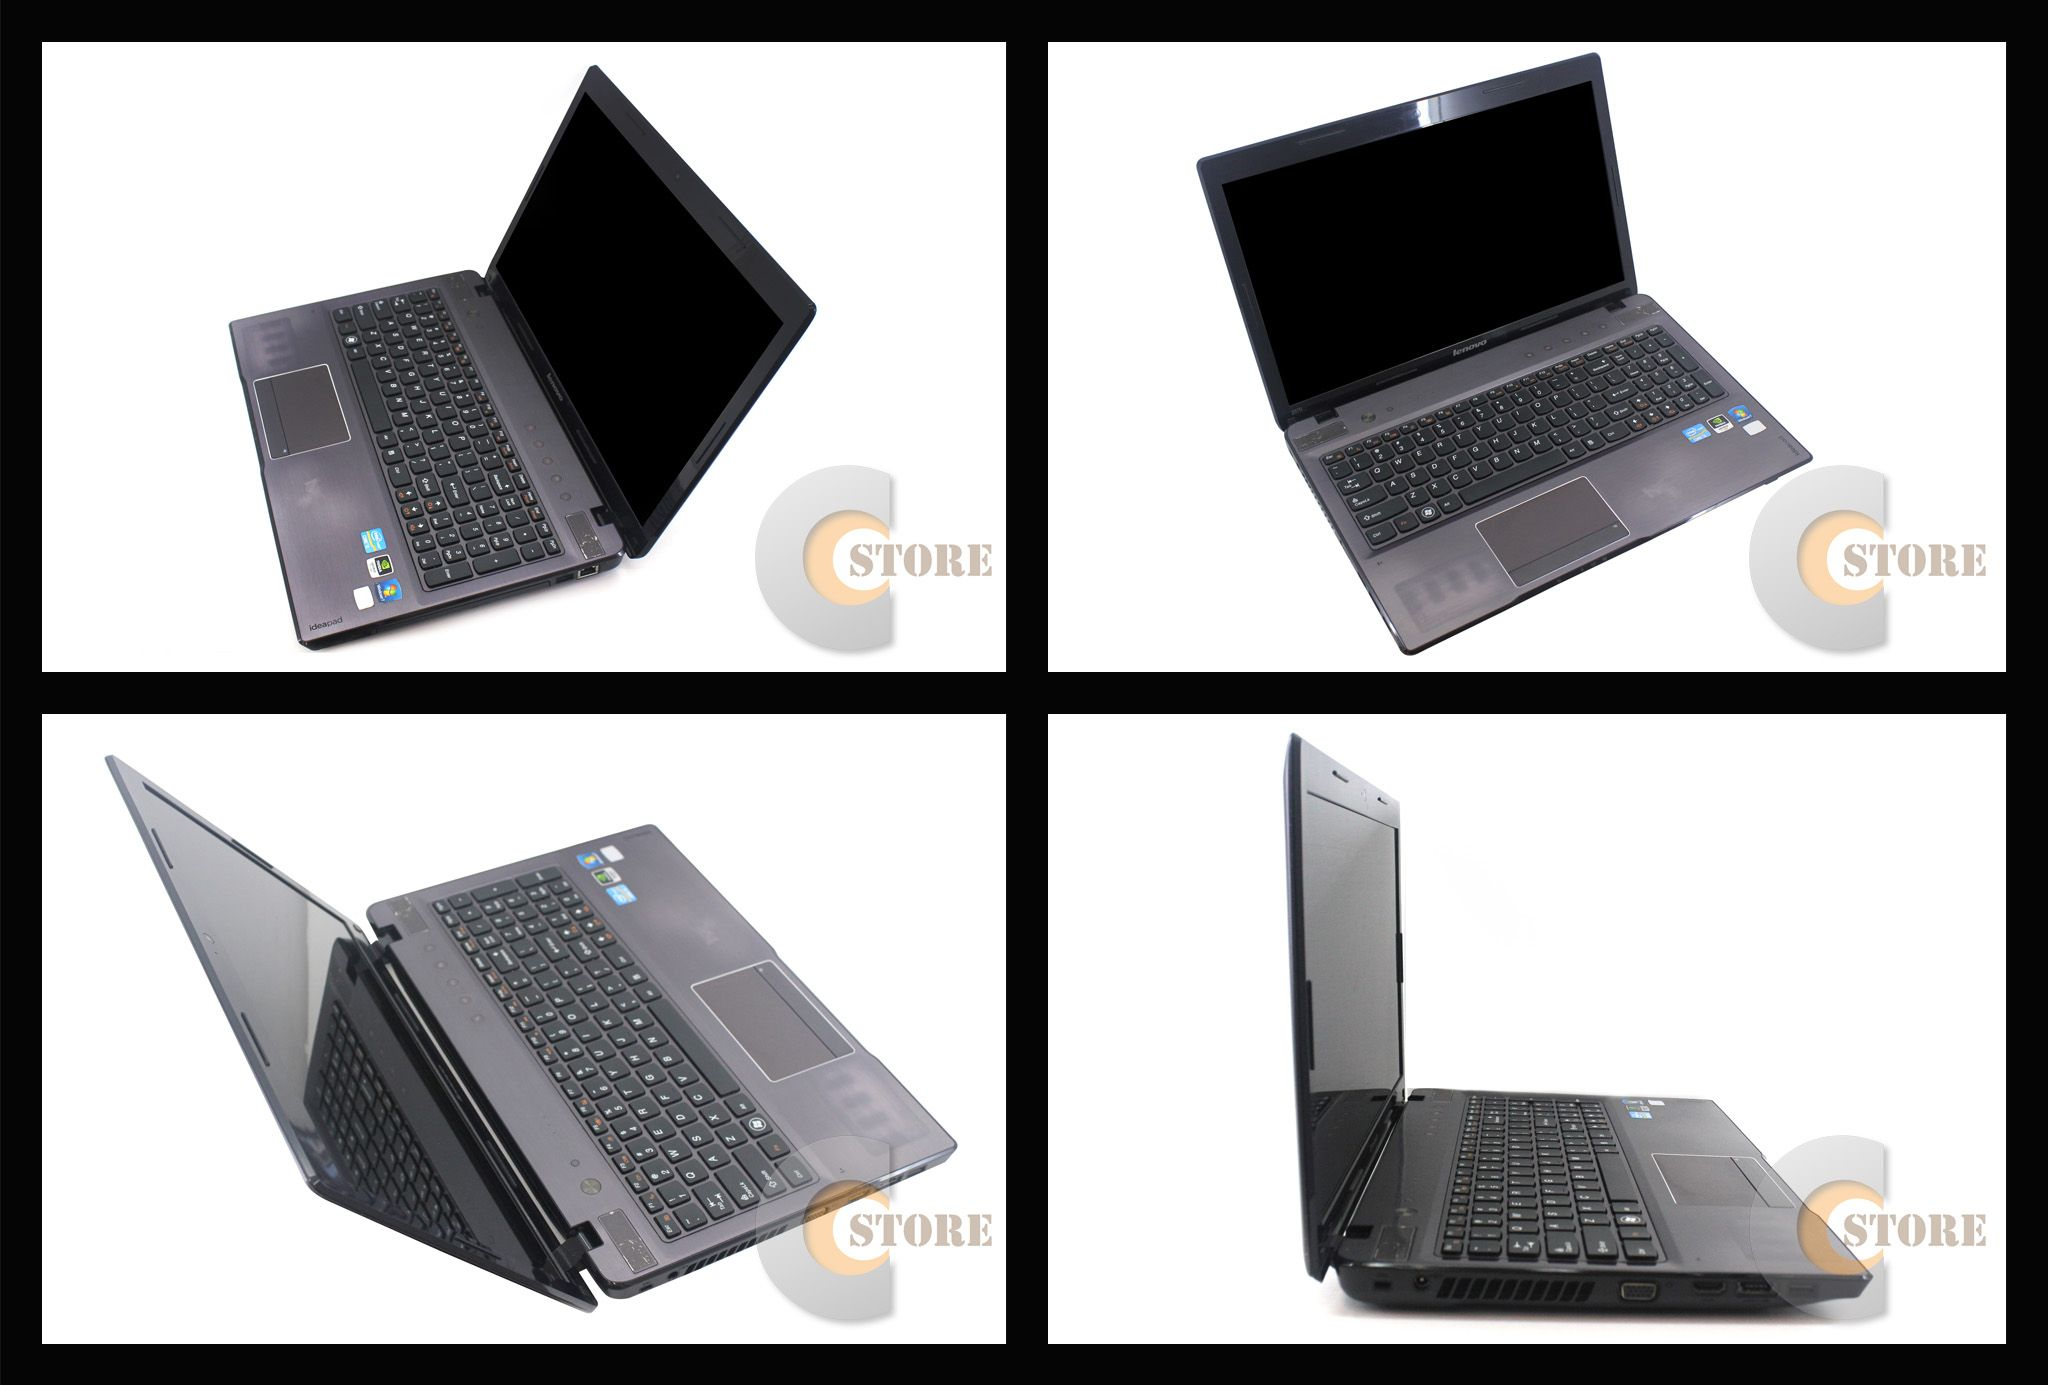 Lenovo Ideapad Z570 Core I5 2430m Multimedia Notebook